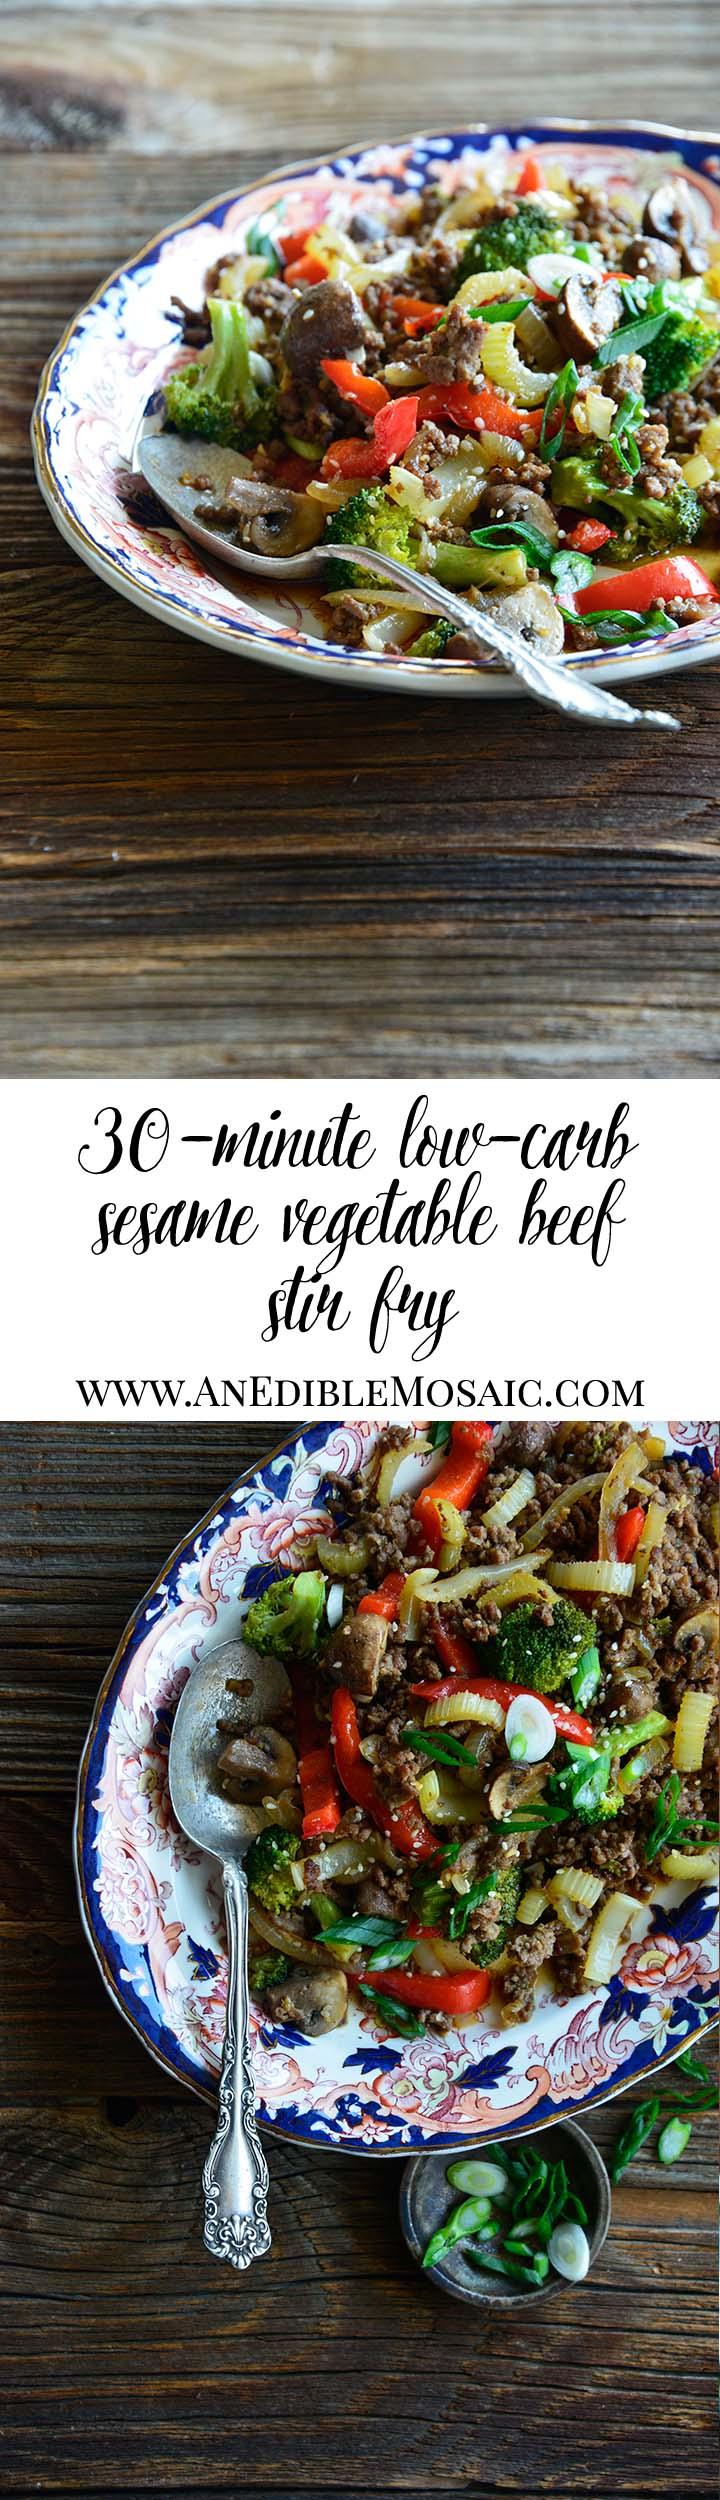 30-Minute Low-Carb Sesame Vegetable Beef Stir Fry Long Pin